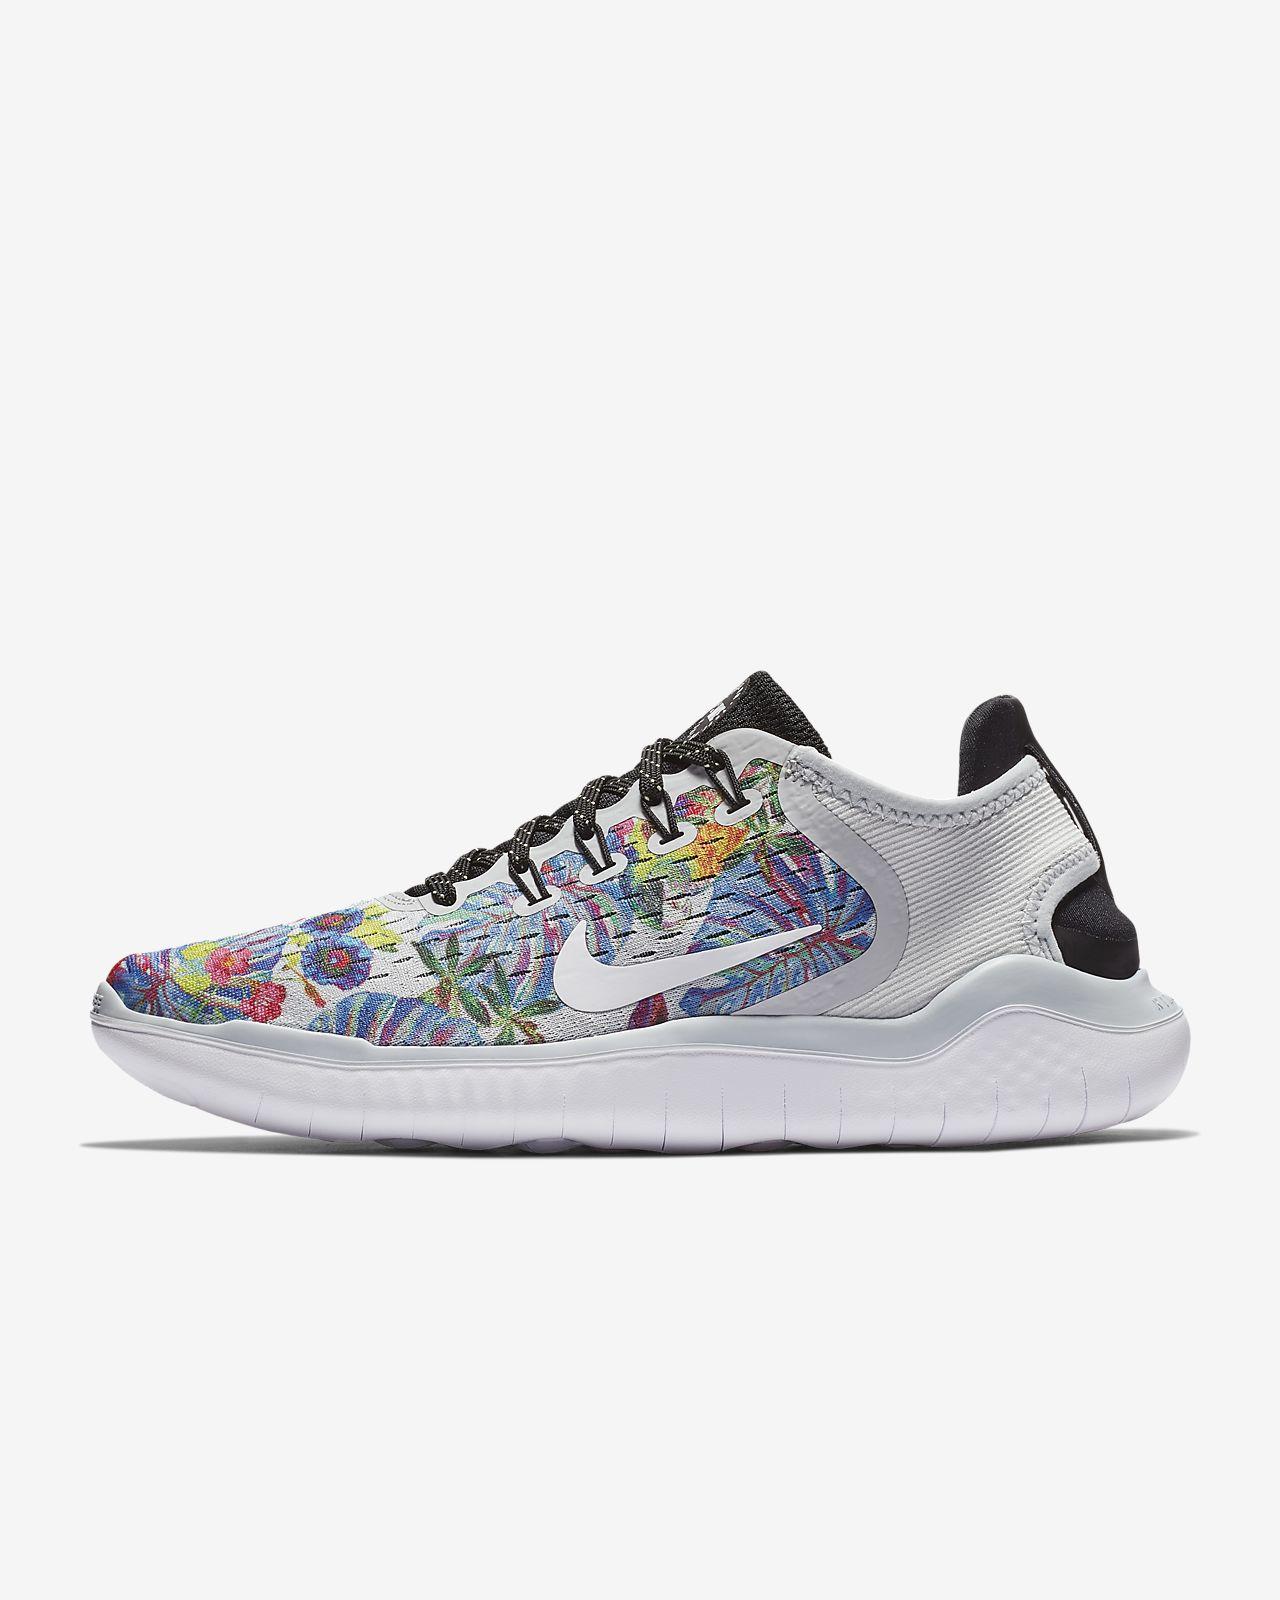 Nike Free RN 2018 Women's Graphic Running Shoe